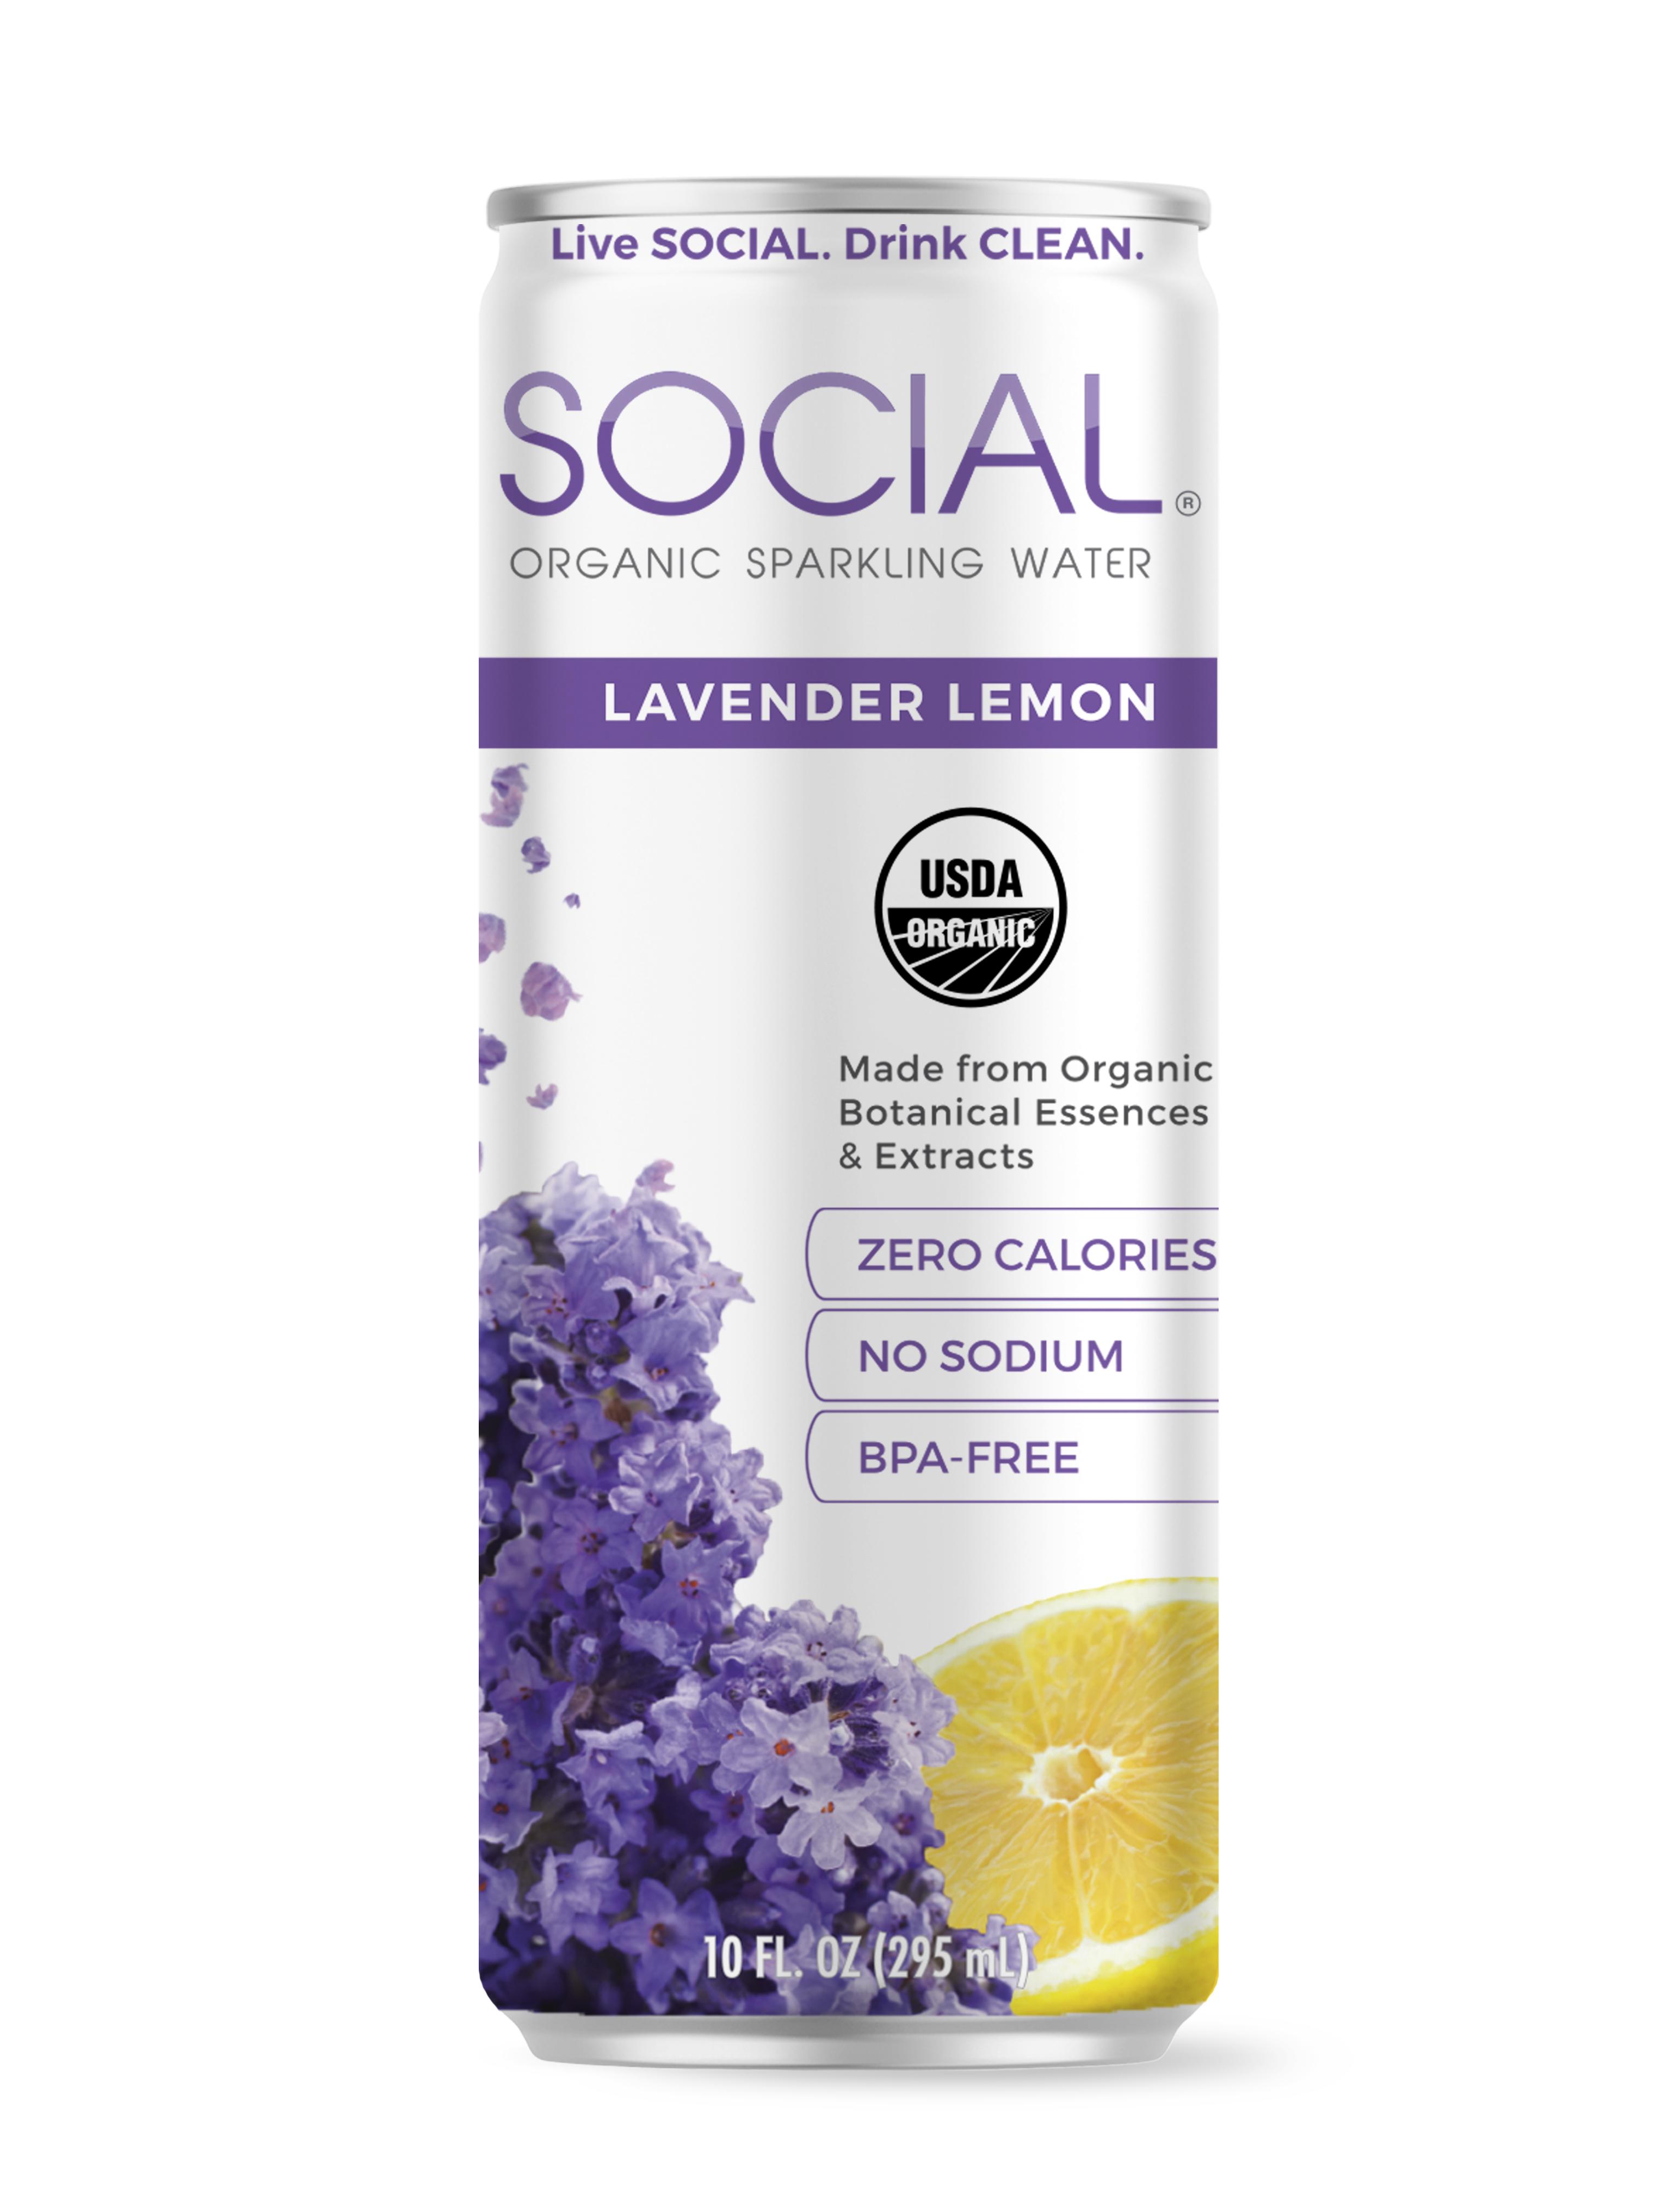 SOCIAL Lavender Lemon Sparkling Water